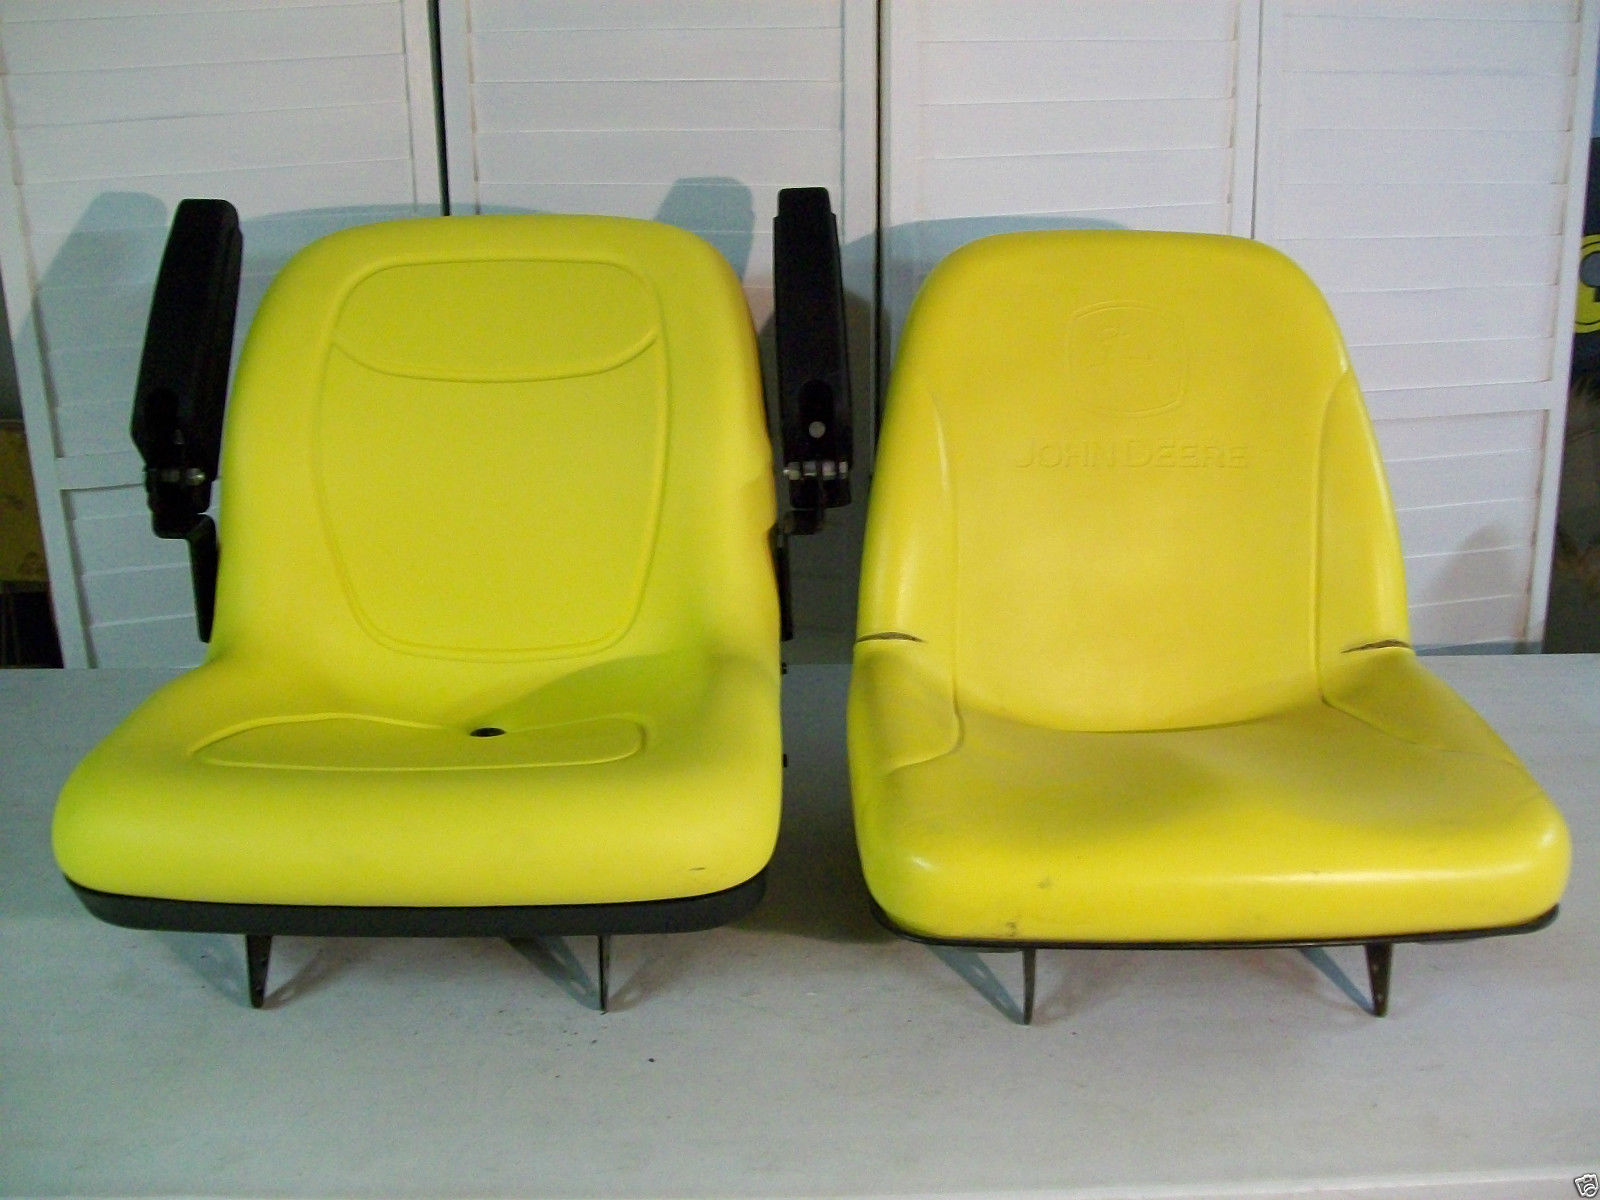 John Deere X729 Parts Diagram X720 Wire X485 Wiring X724 Yellow Seat X495 X575 X585 X595